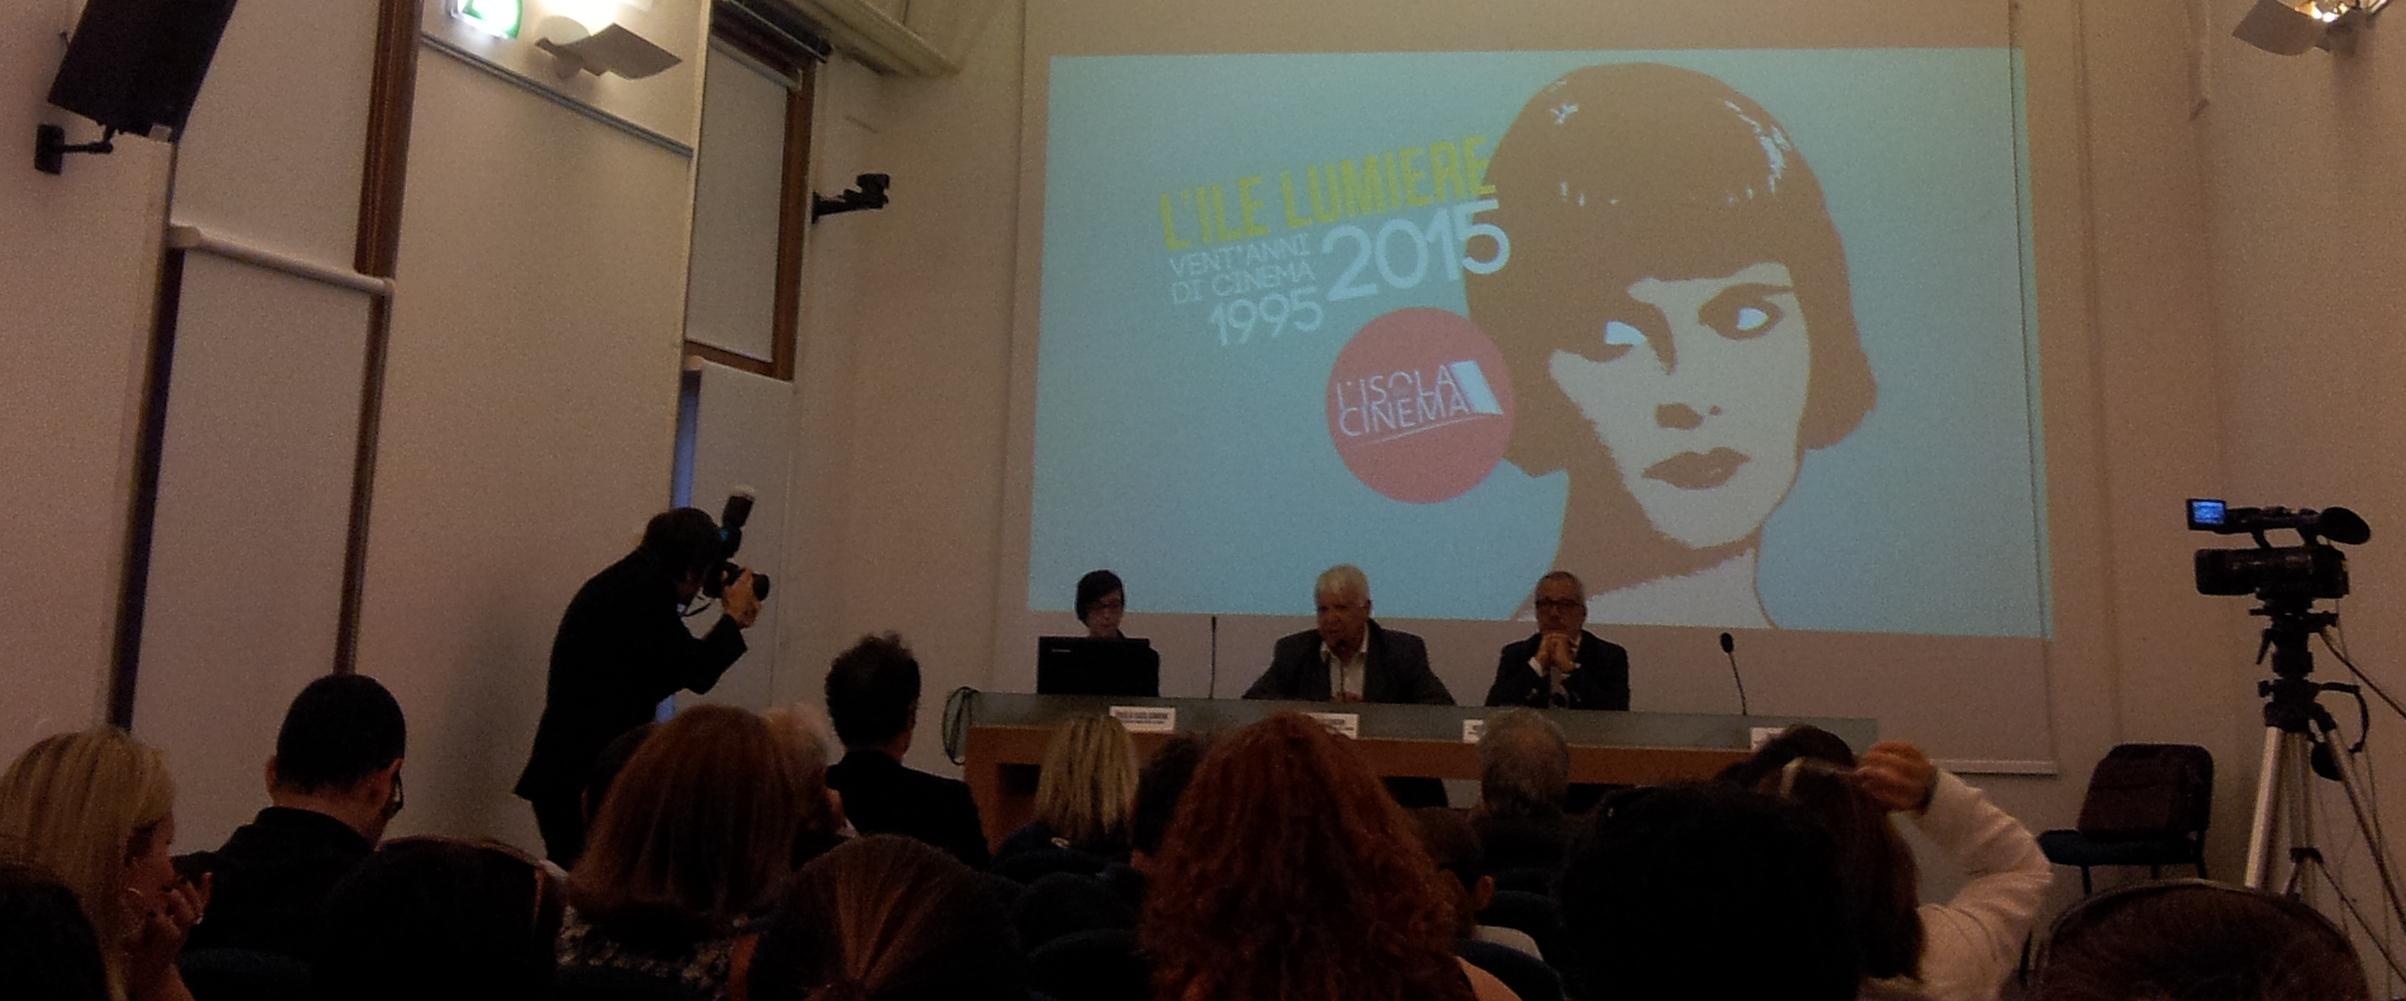 conferenza stampa isola del cinema